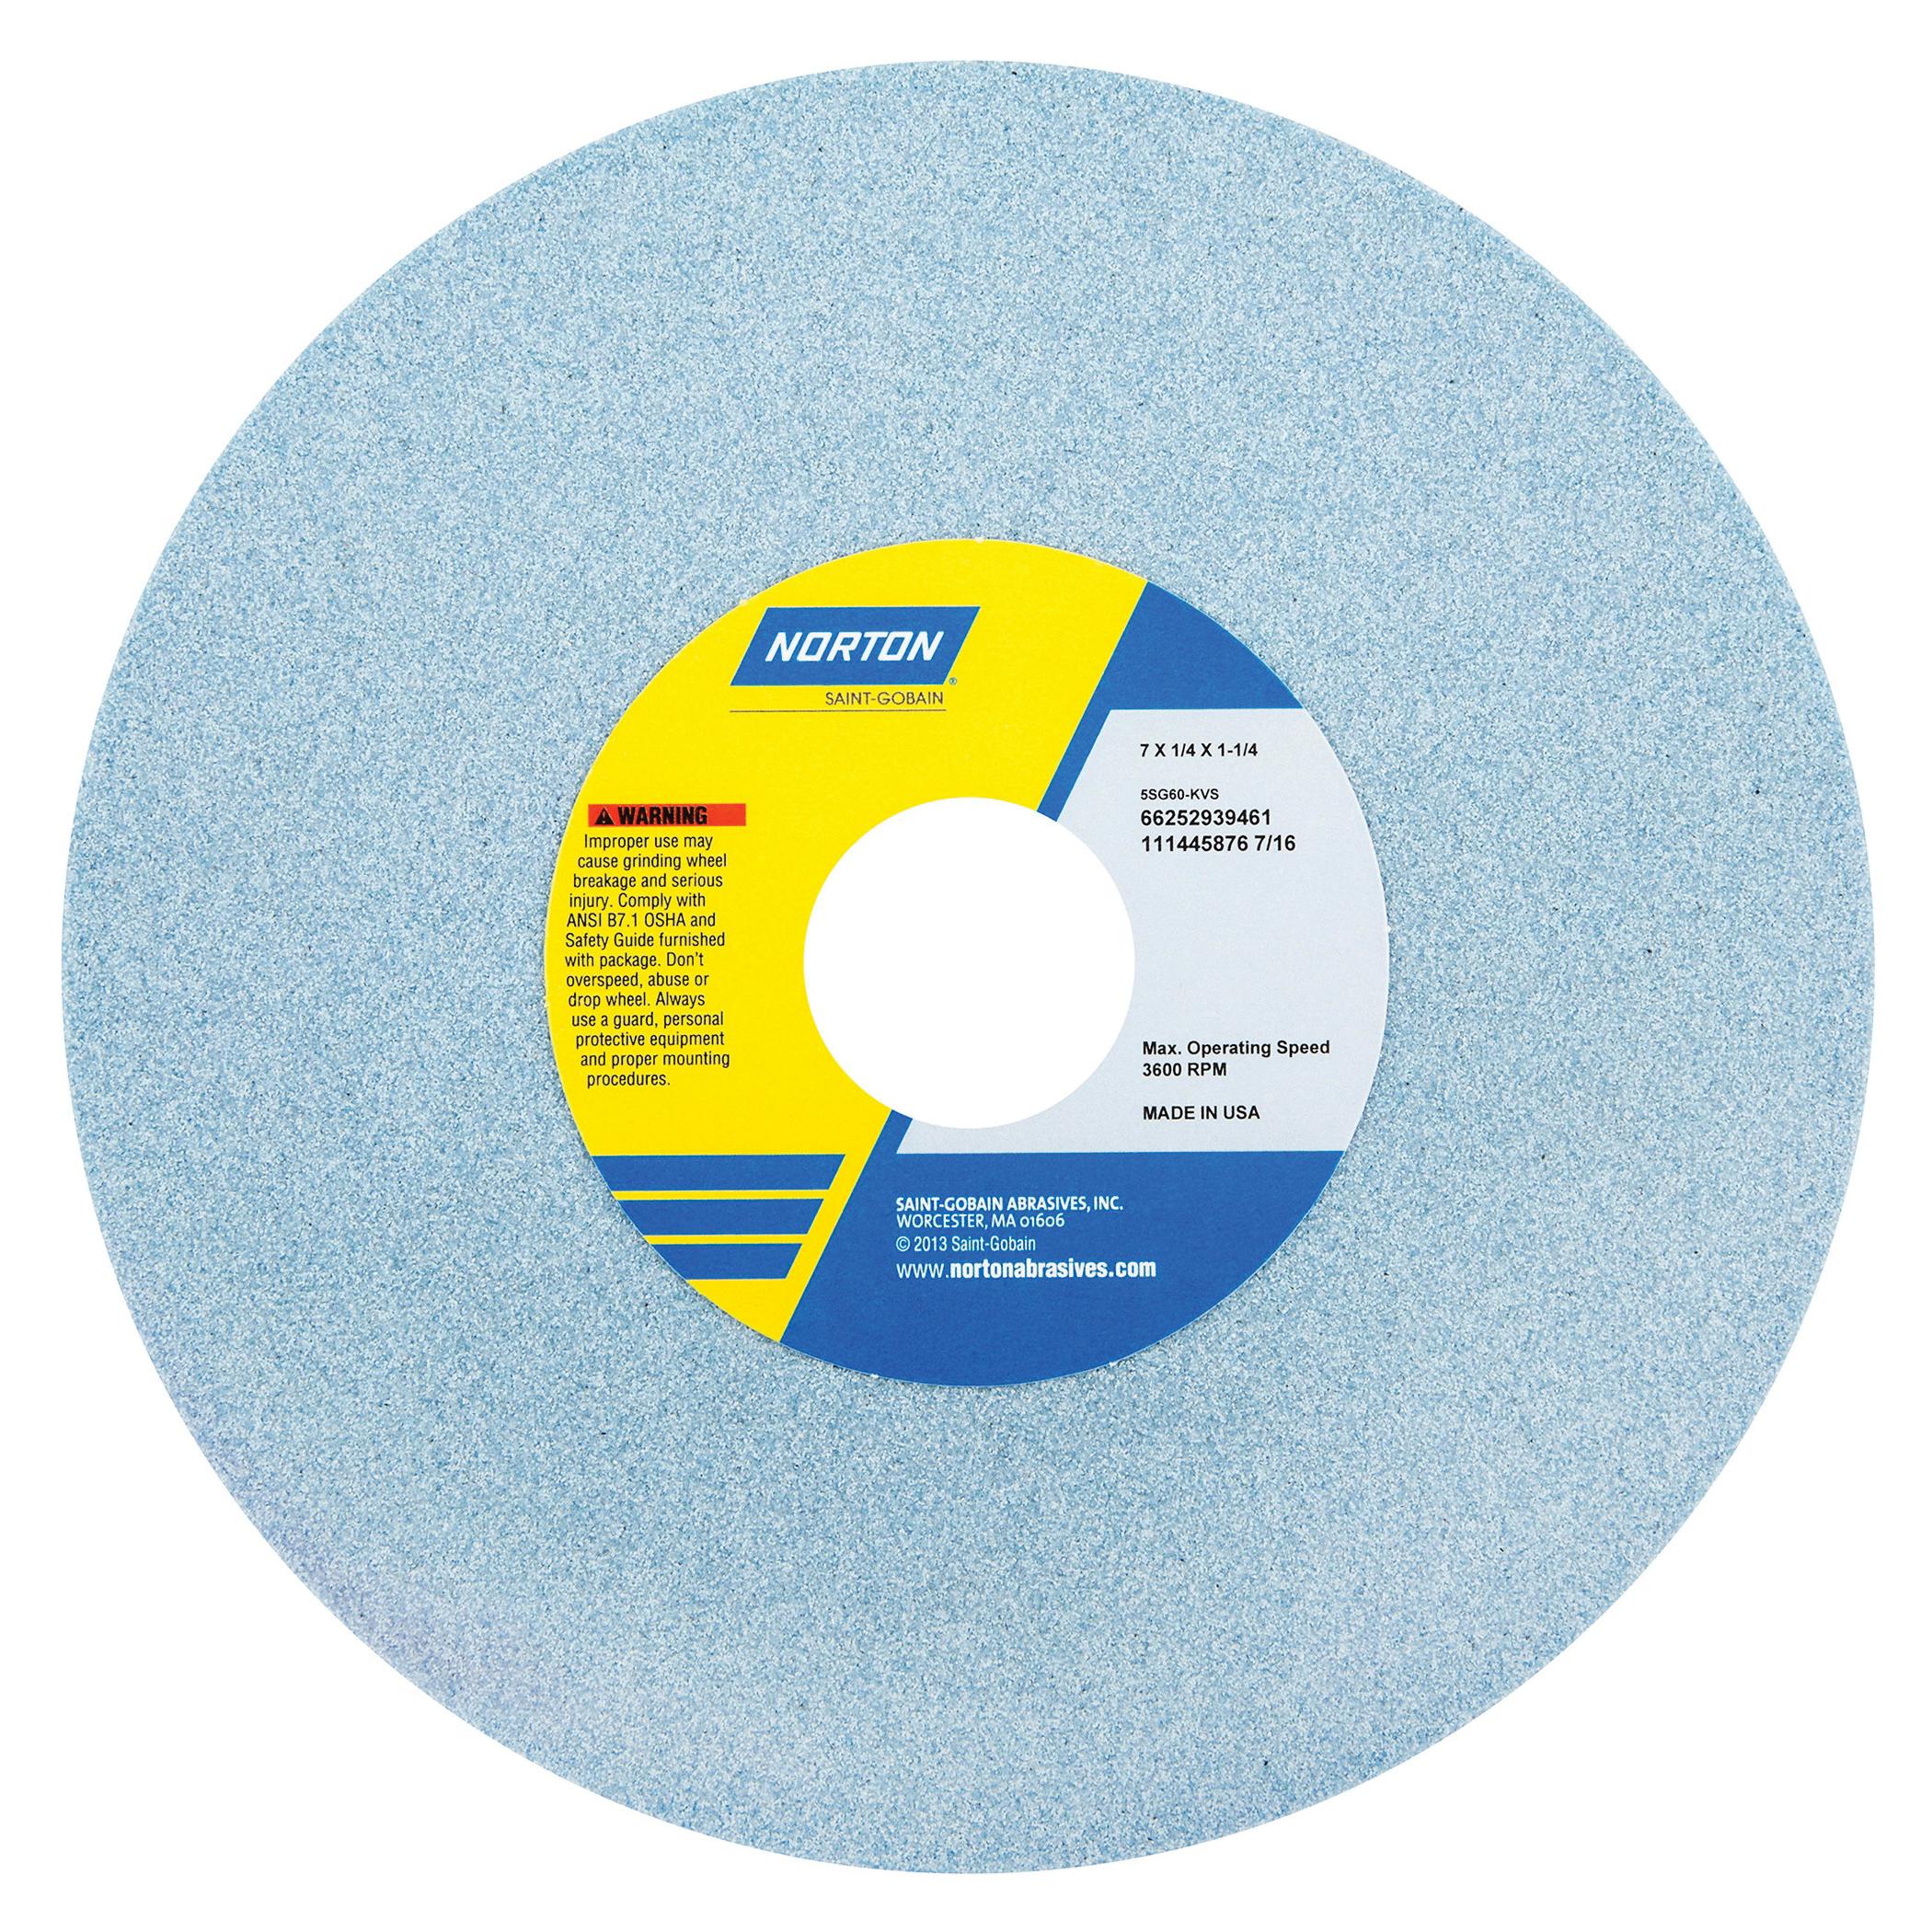 Norton® 66252939462 5SG Straight Toolroom Wheel, 7 in Dia x 1/4 in THK, 1-1/4 in Center Hole, 80 Grit, Ceramic Alumina/Friable Aluminum Oxide Abrasive